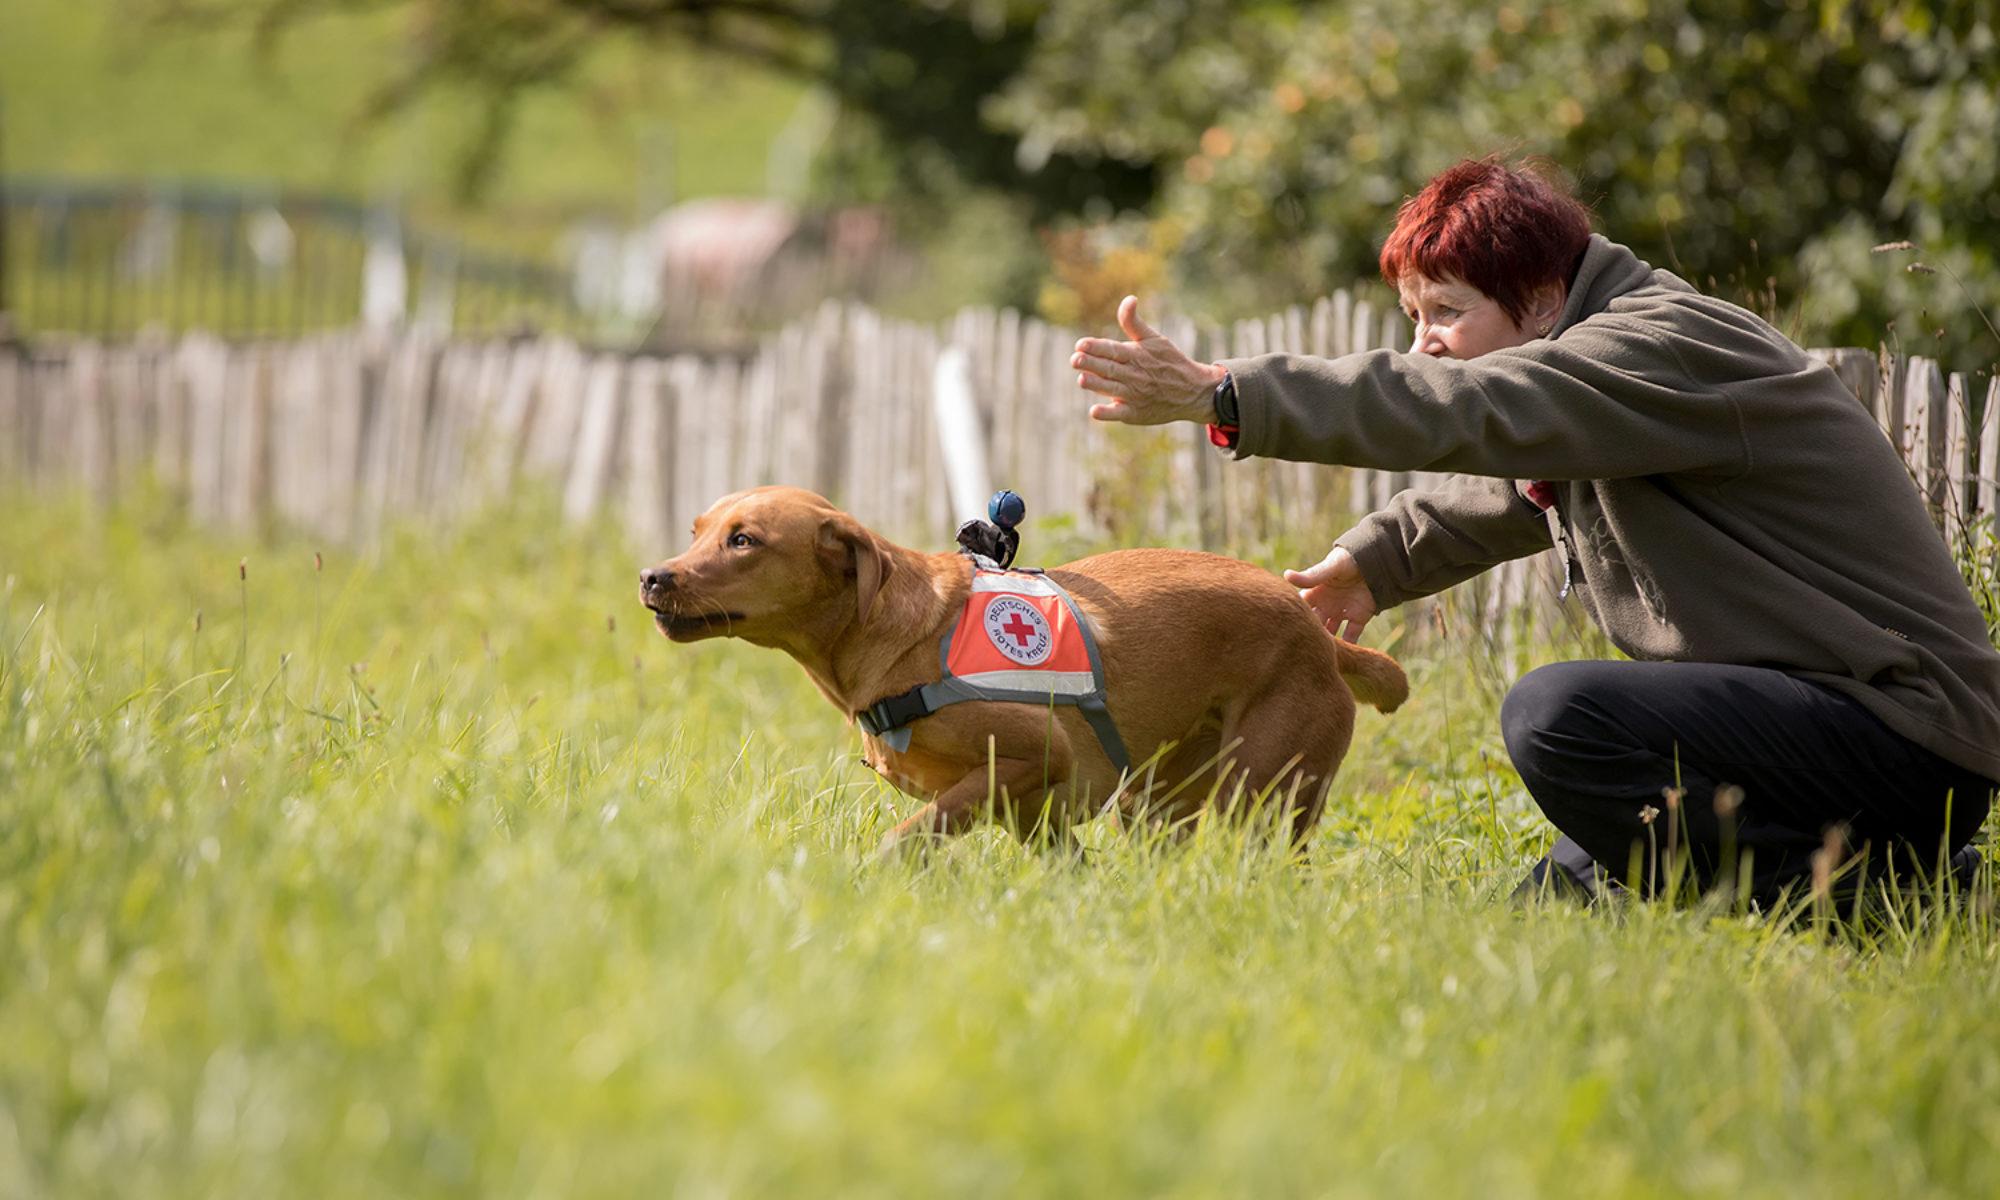 Rettungshundestaffel Hof